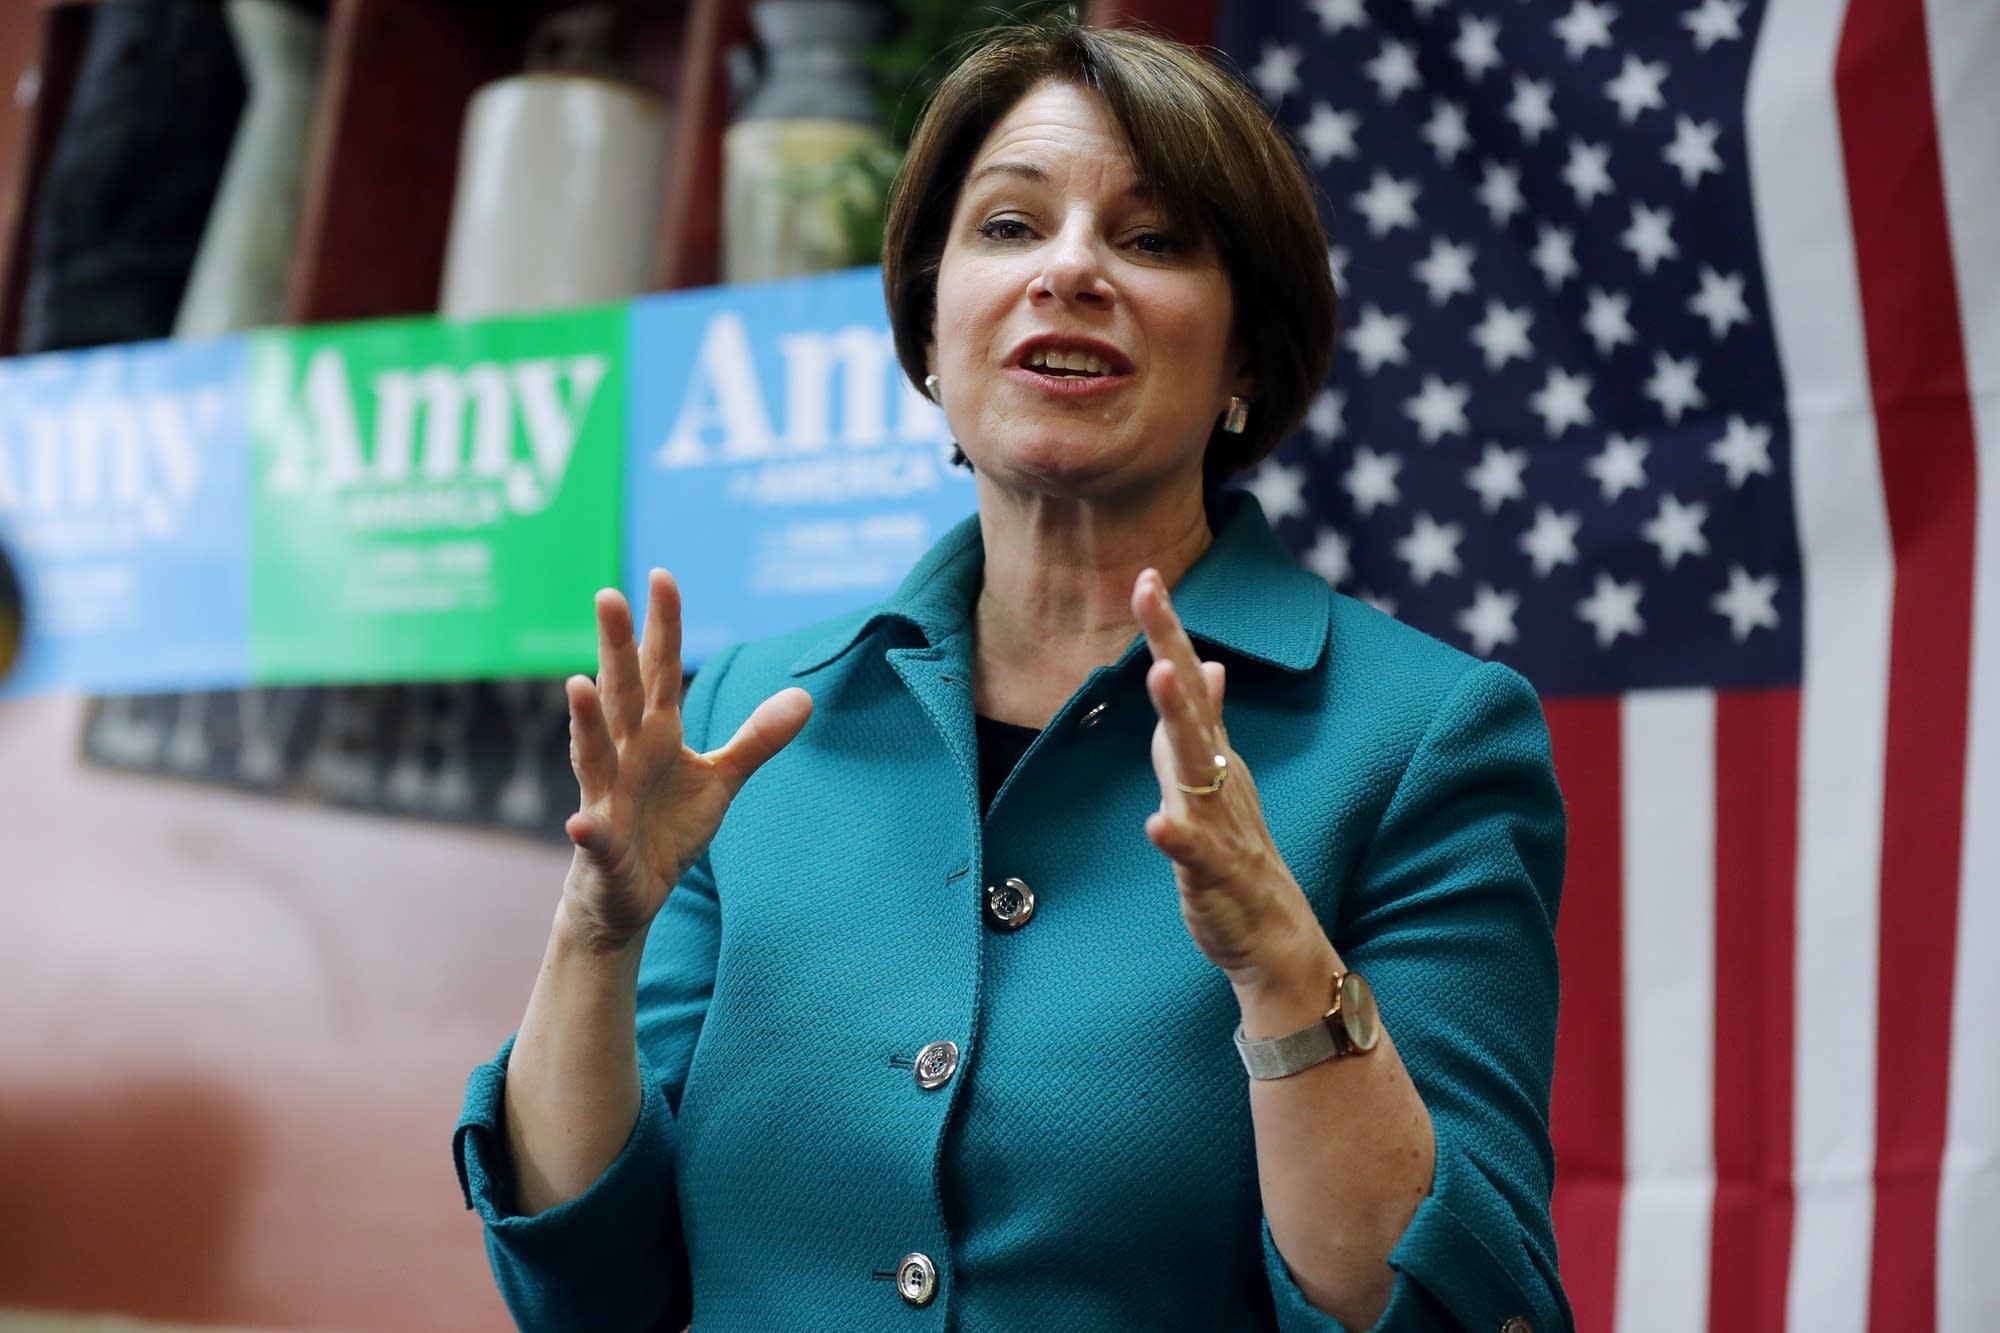 Presidential candidate U.S. Sen. Amy Klobuchar campaigns in Iowa.